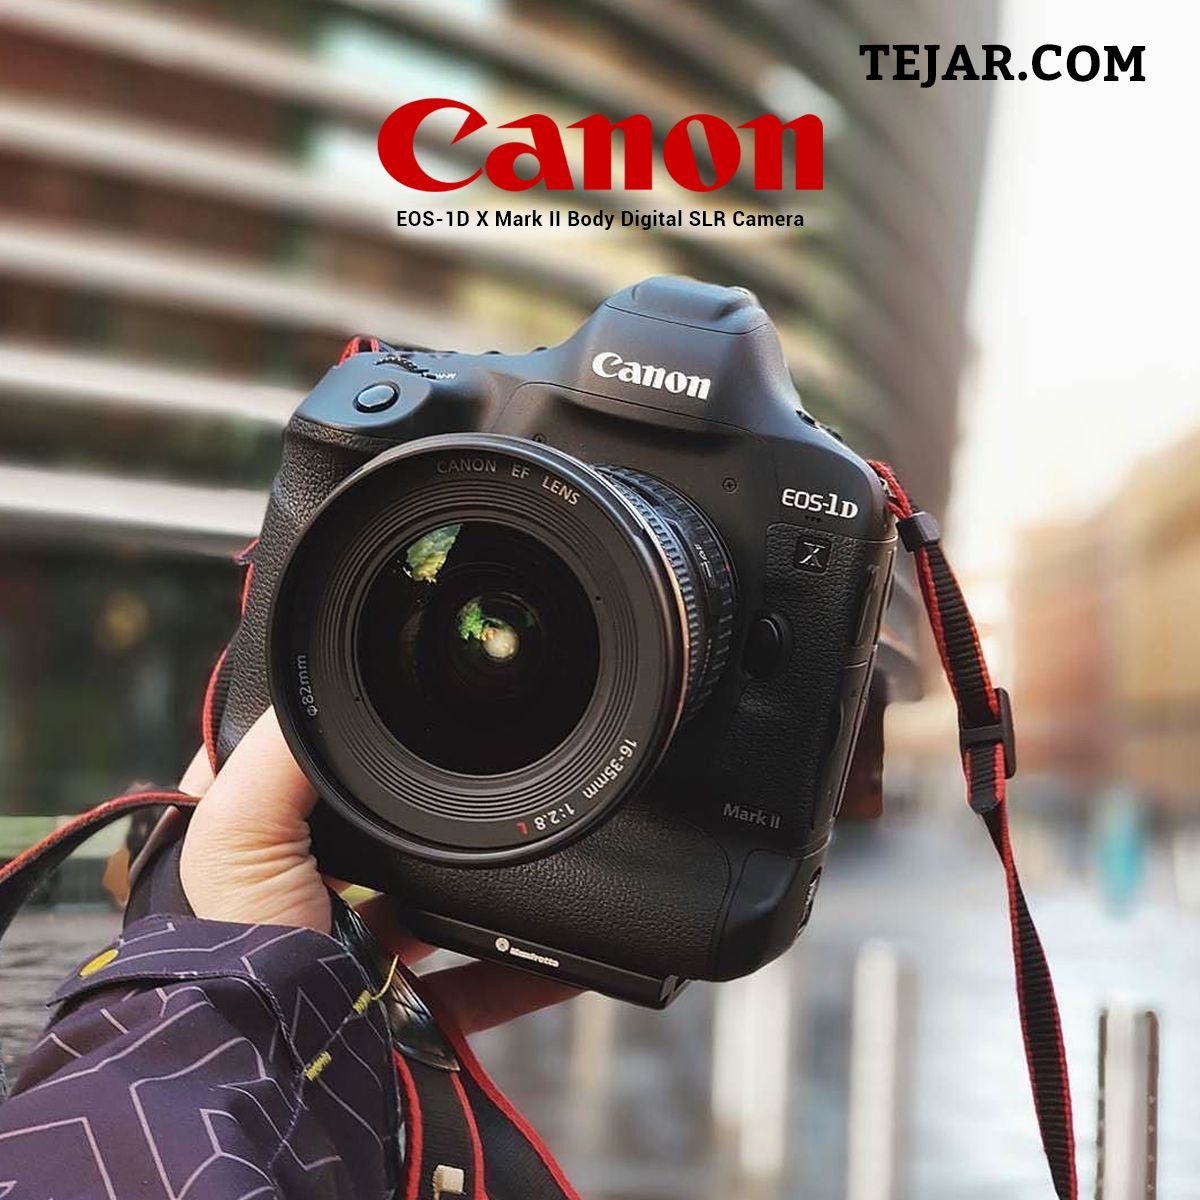 Canon Eos 1d X Mark Ii Body Digital Slr Camera In 2021 Canon Camera Camera Stylish Camera